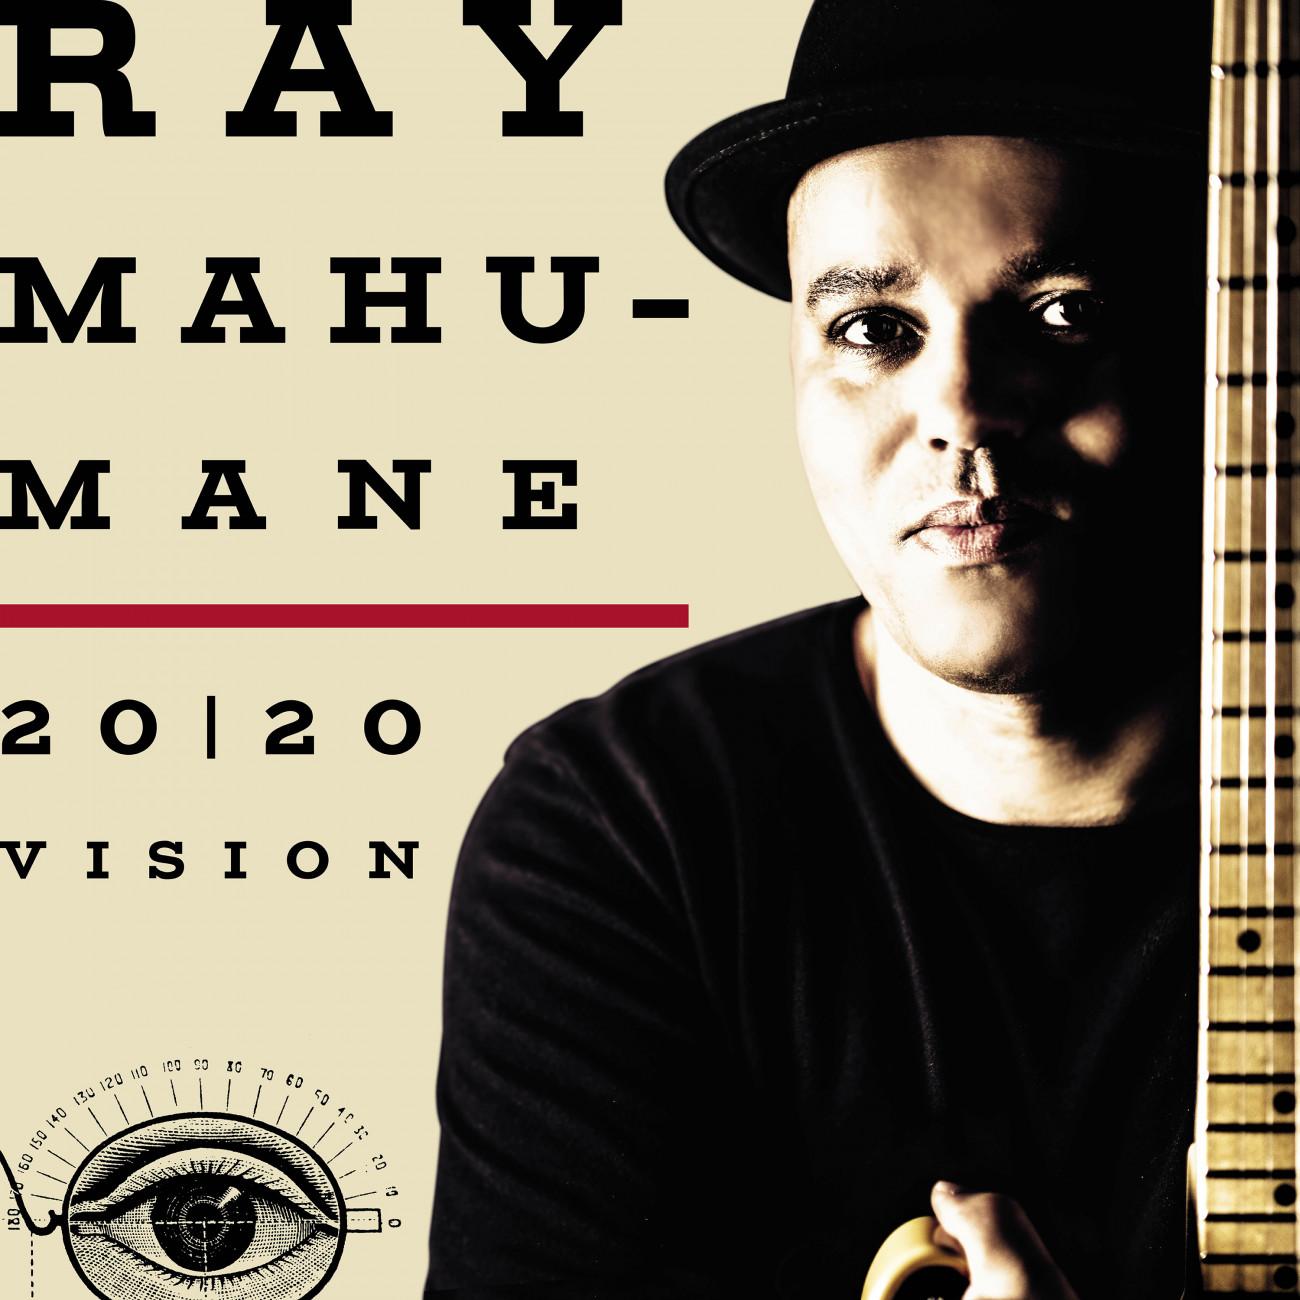 Ray Mahumane, 20/20 Vision Gerald Schilling